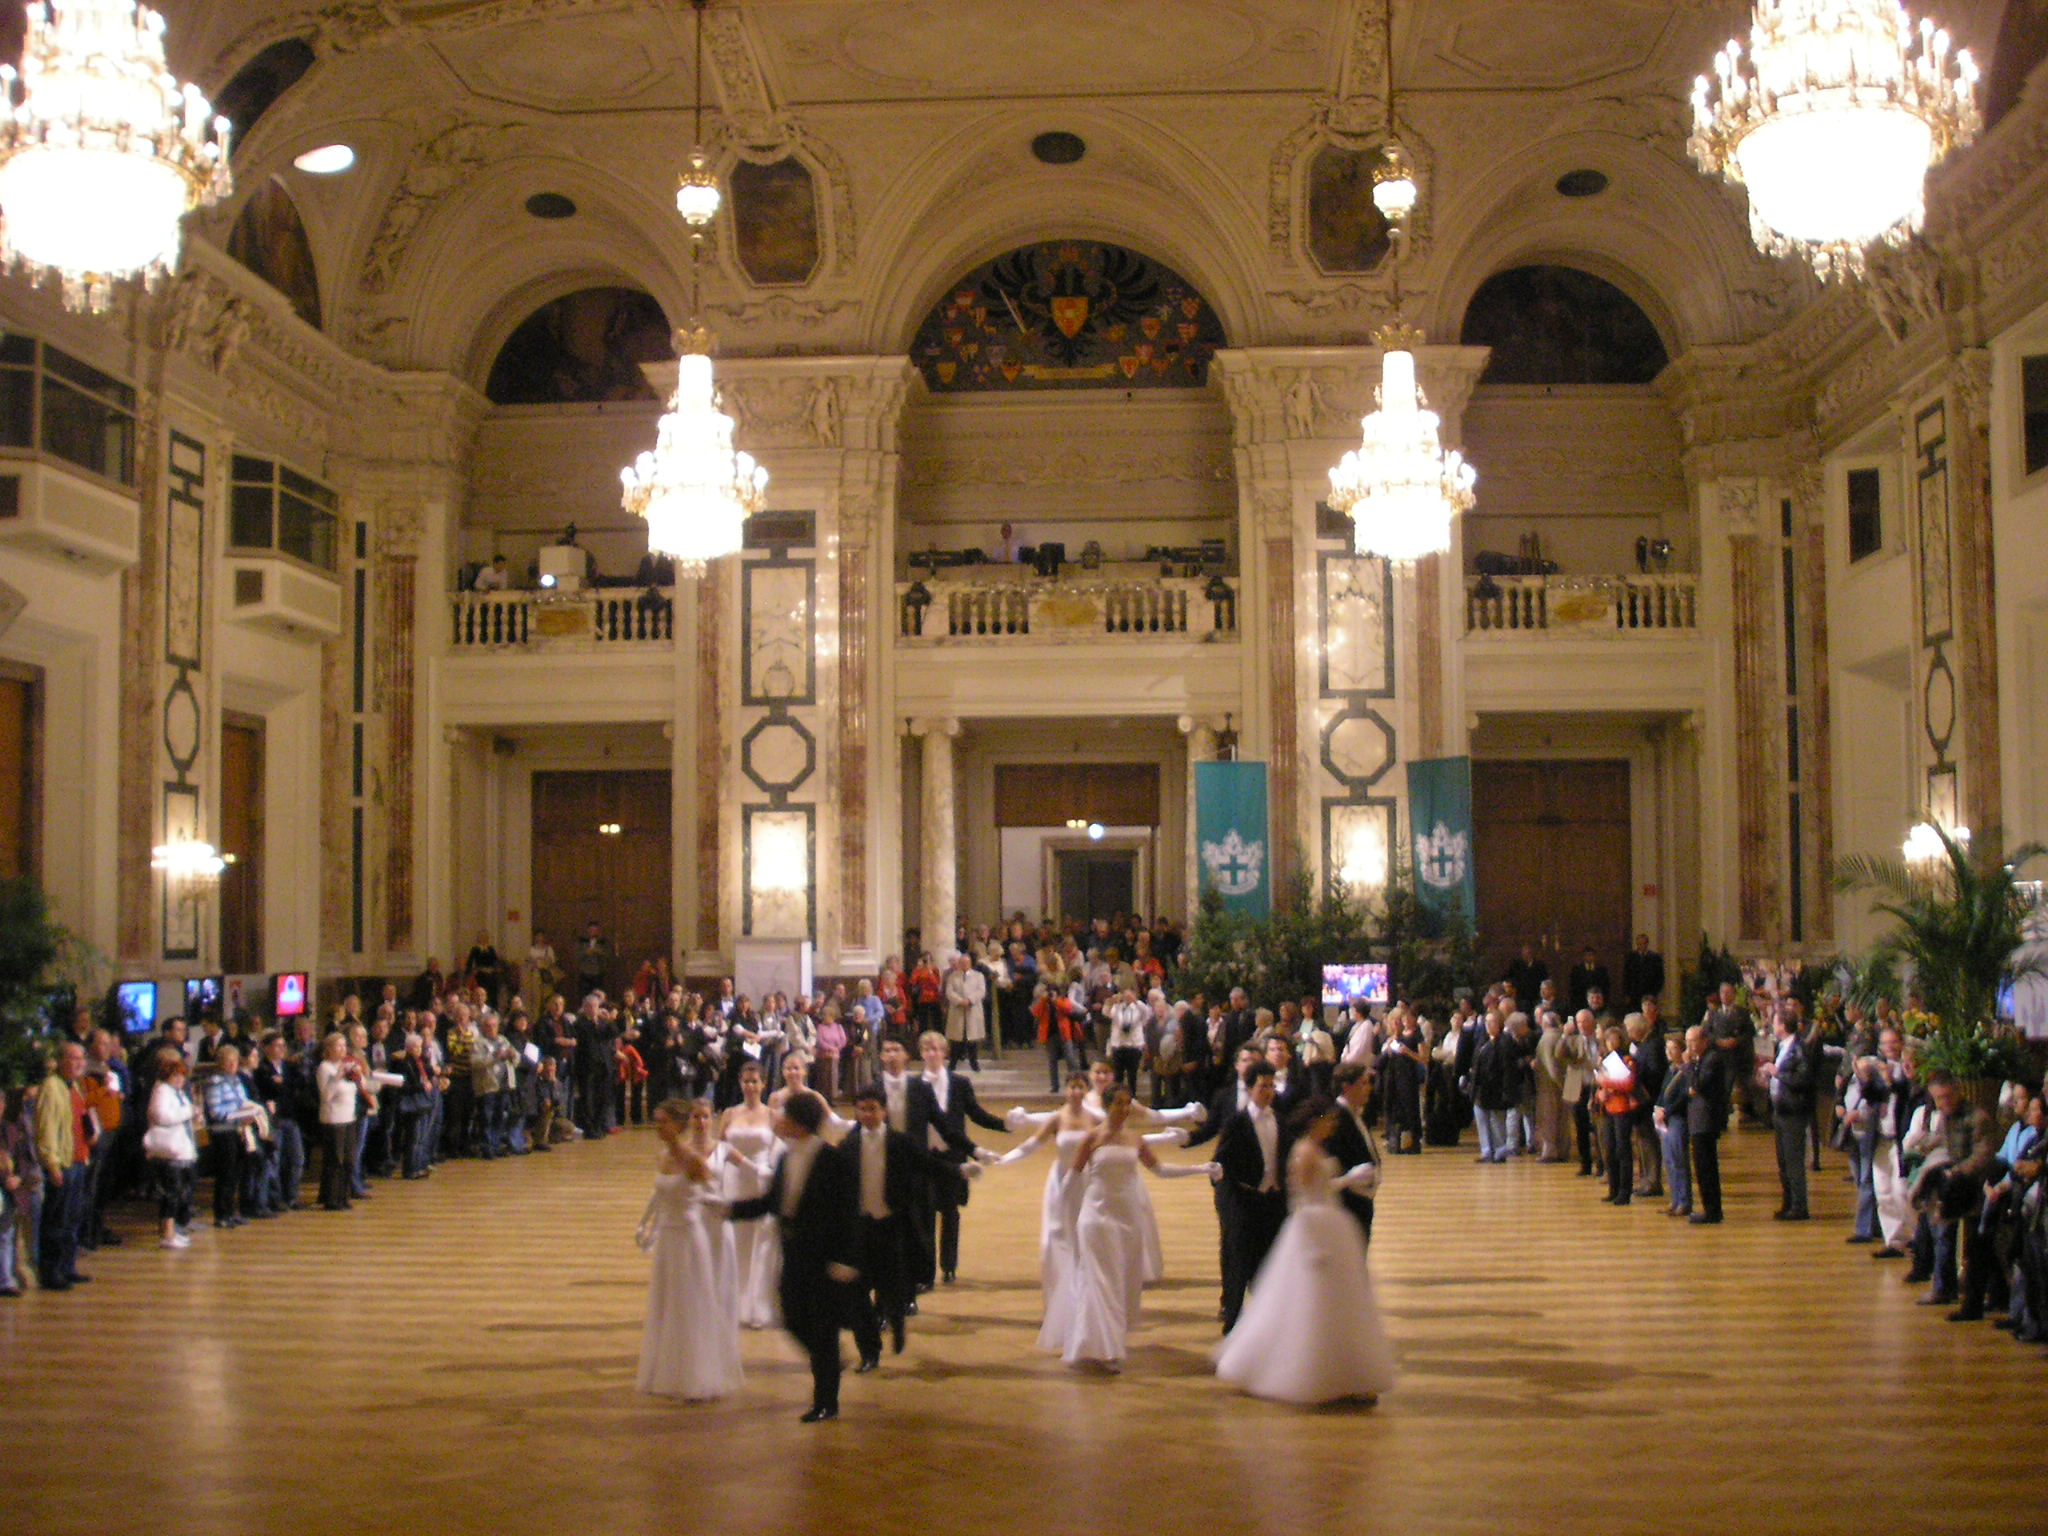 amerikai francia dance site)